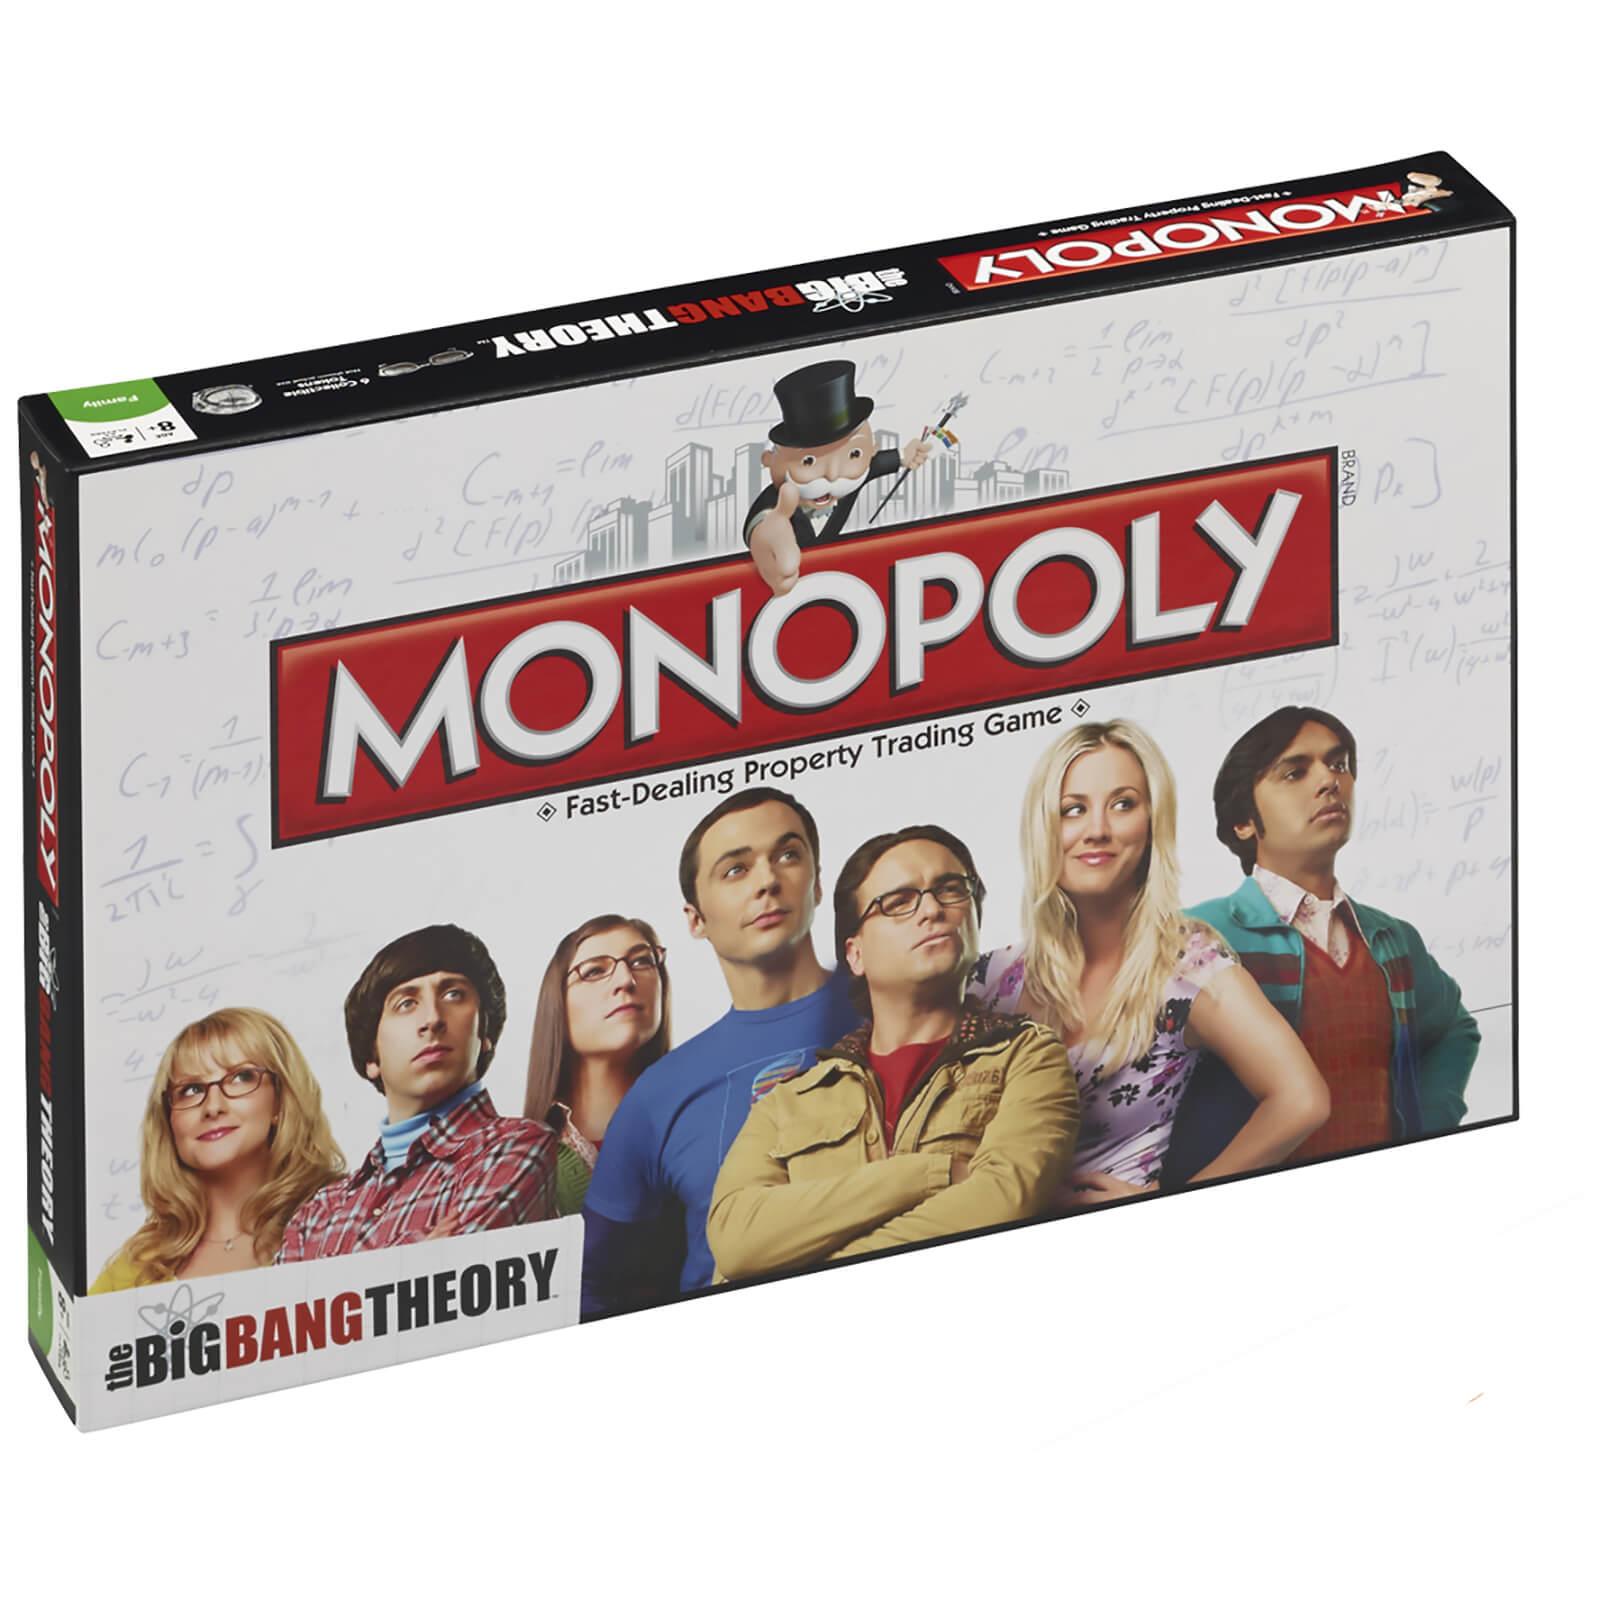 Image of Monopoly Board Game - The Big Bang Theory Edition